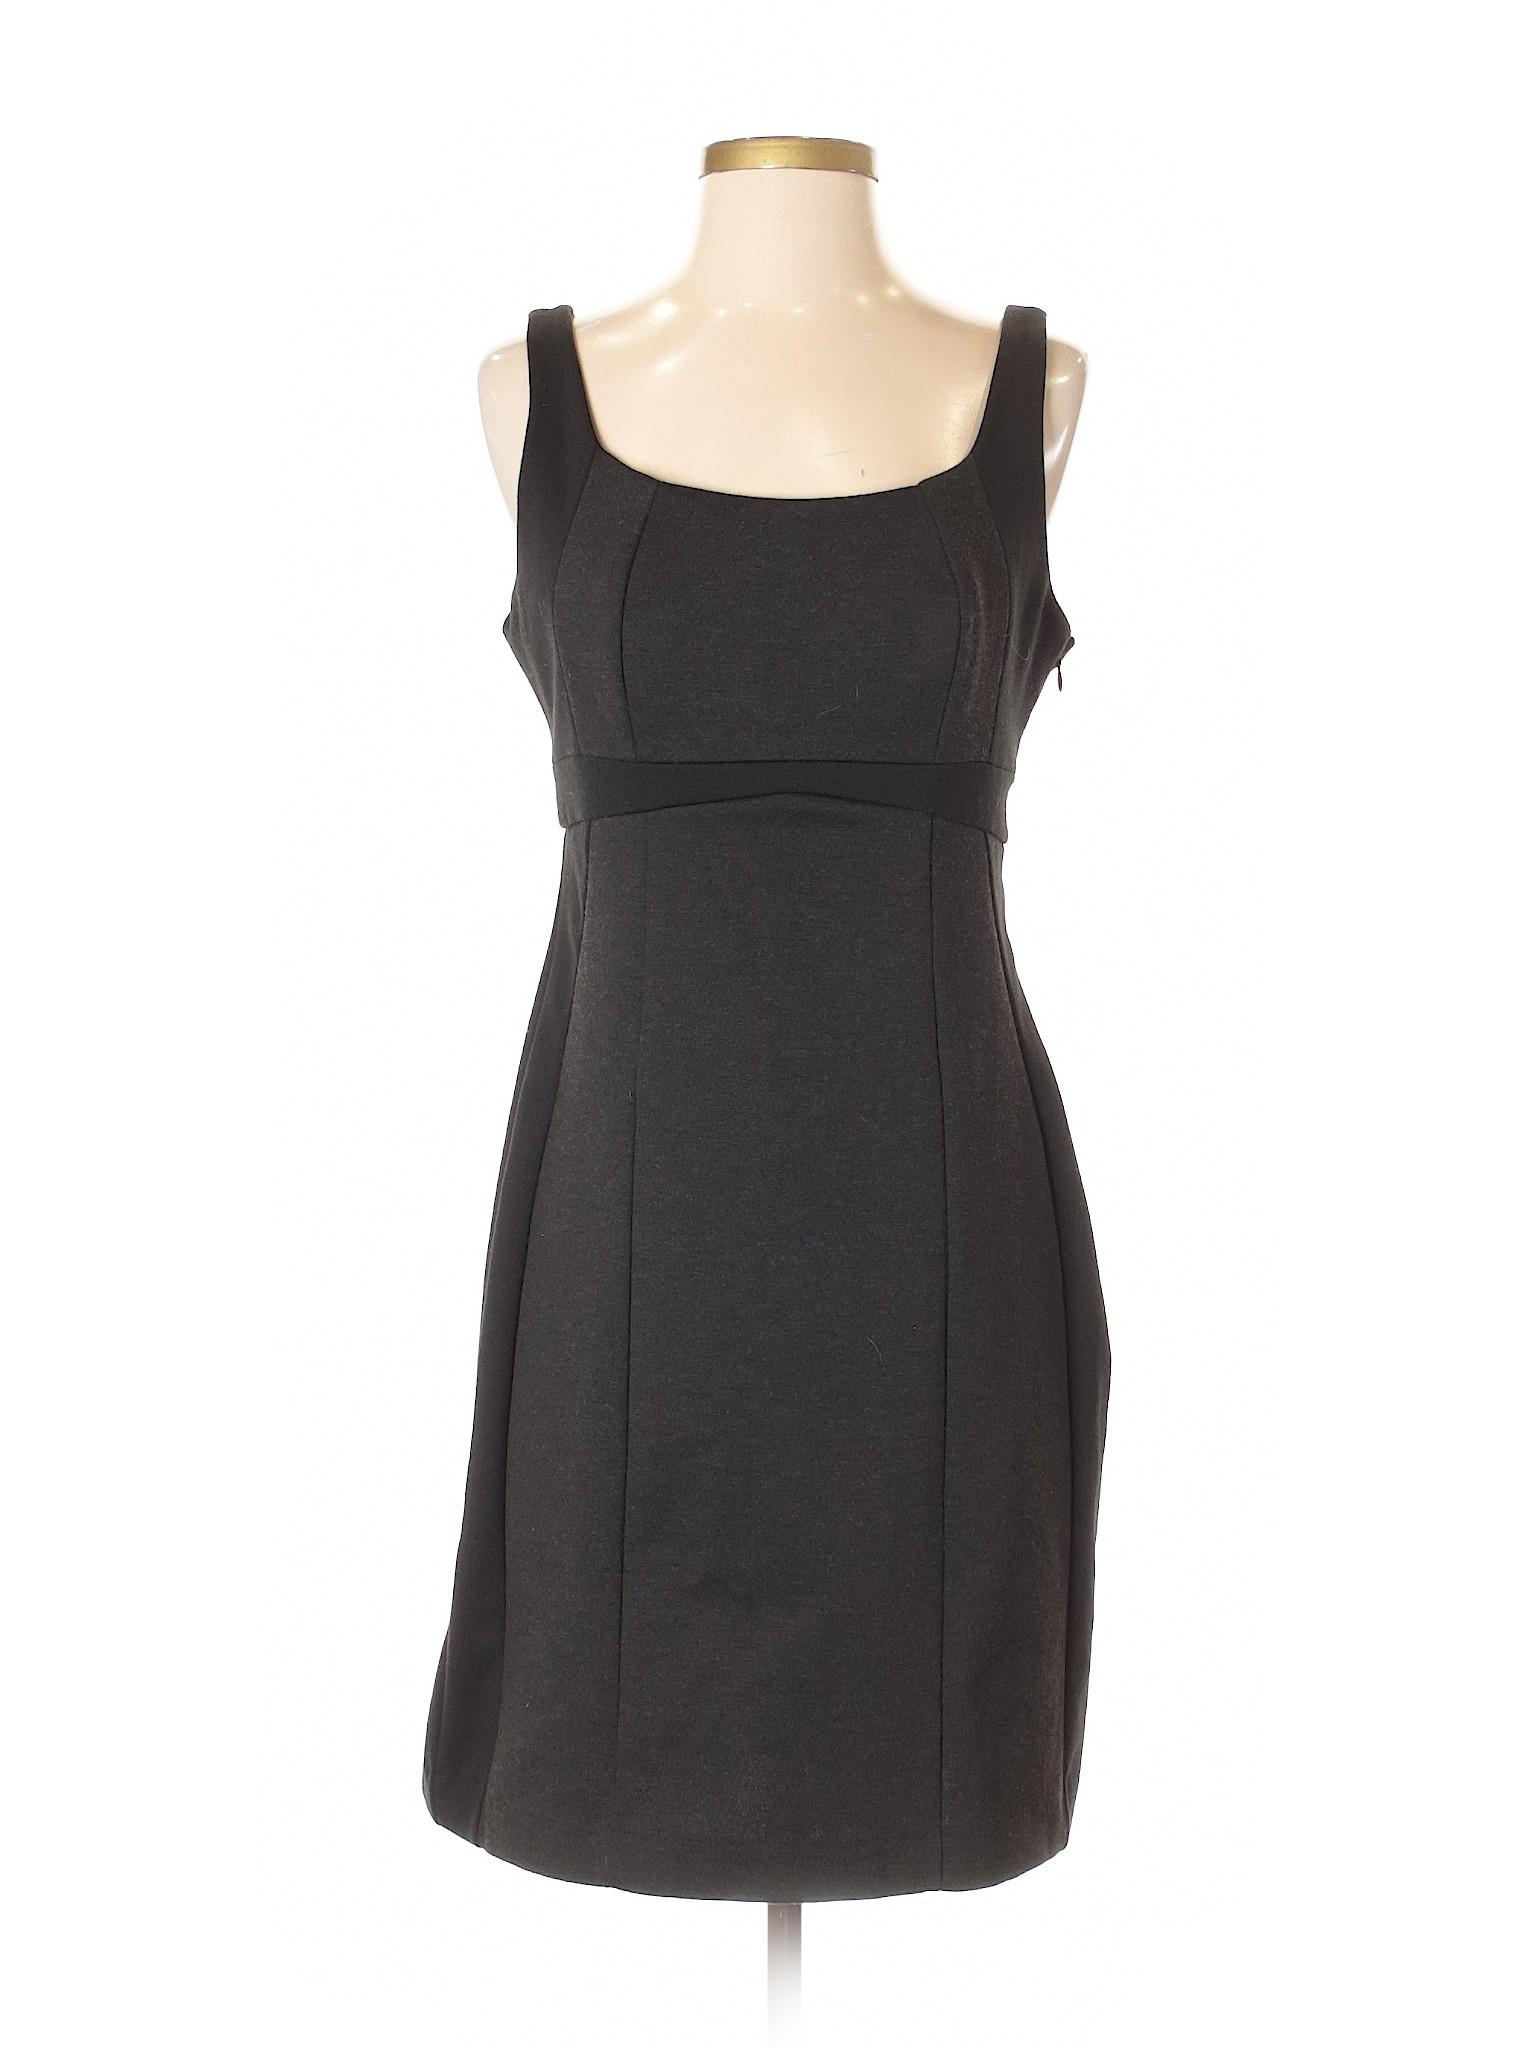 Dress York New Selling amp; Casual Company XTZUB